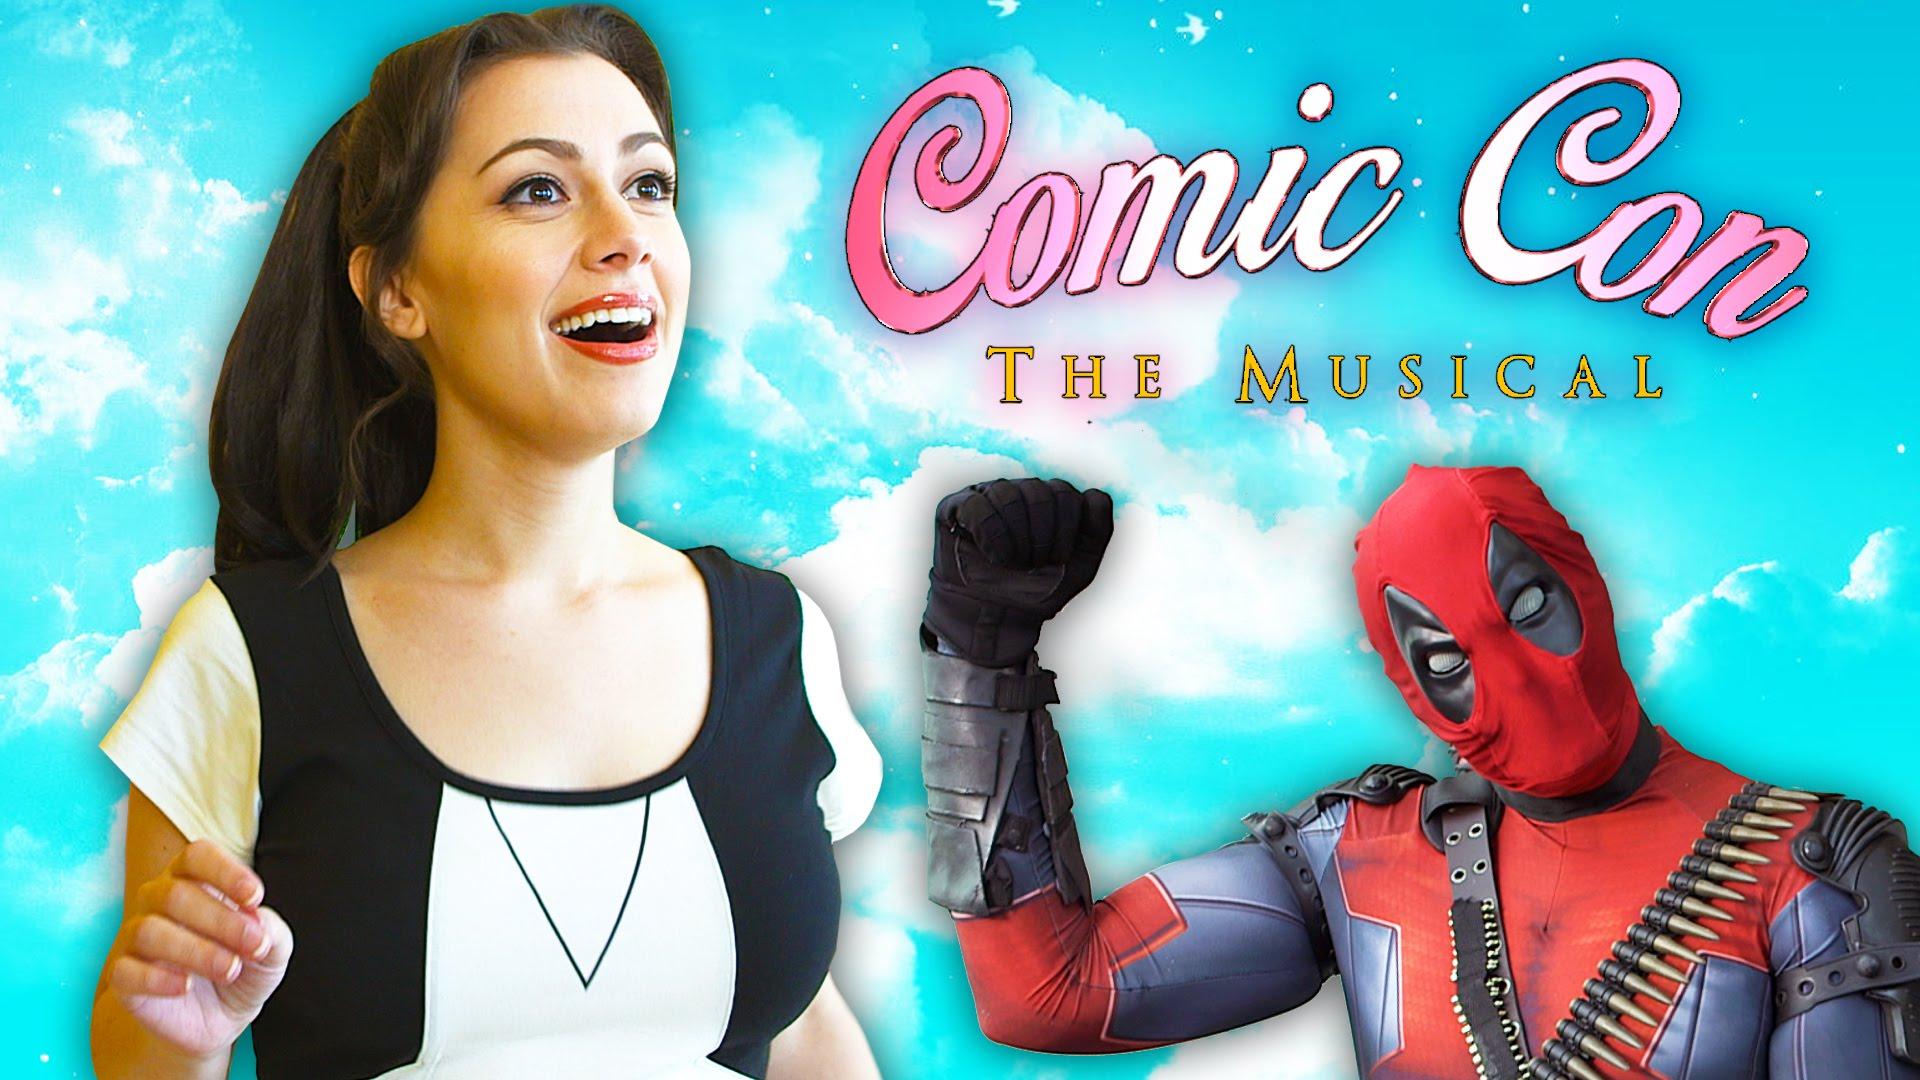 San Diego Comic Con: The Musical